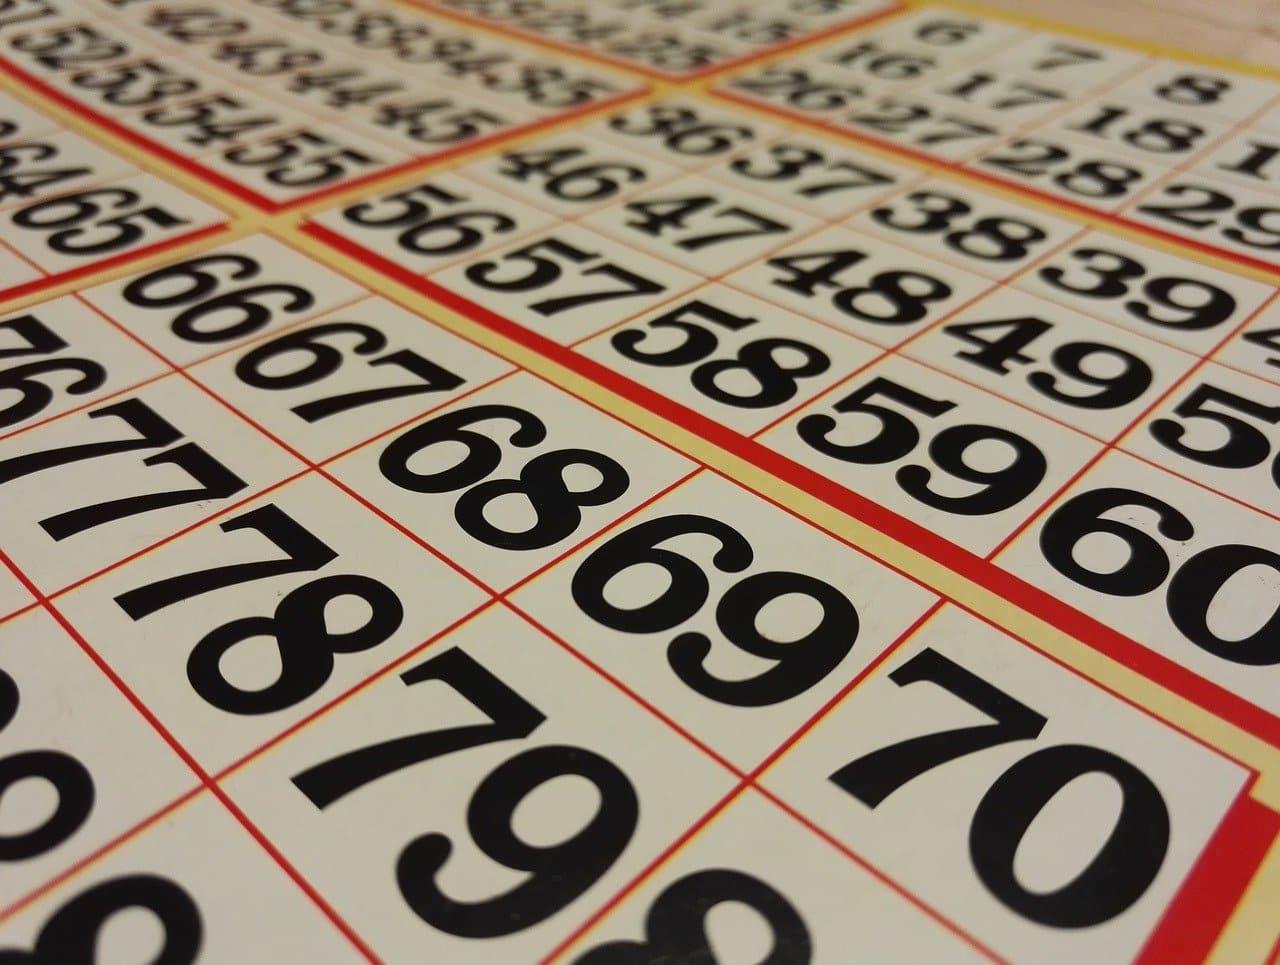 Bingo online gratuito